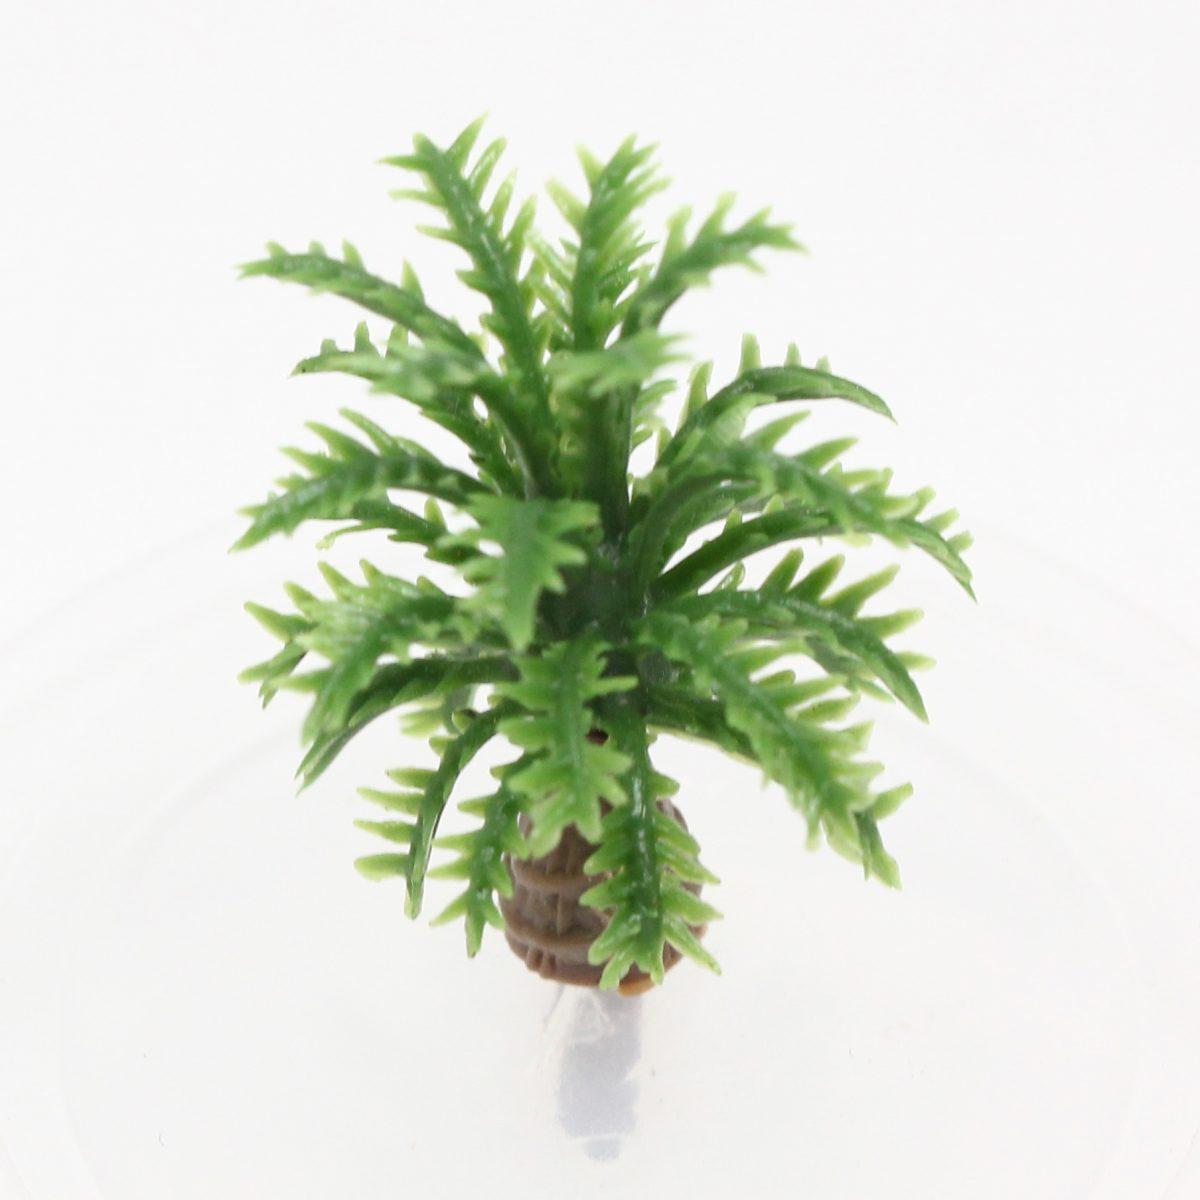 Model Tree suit Tree Fern or Palm - 3cm Image 1